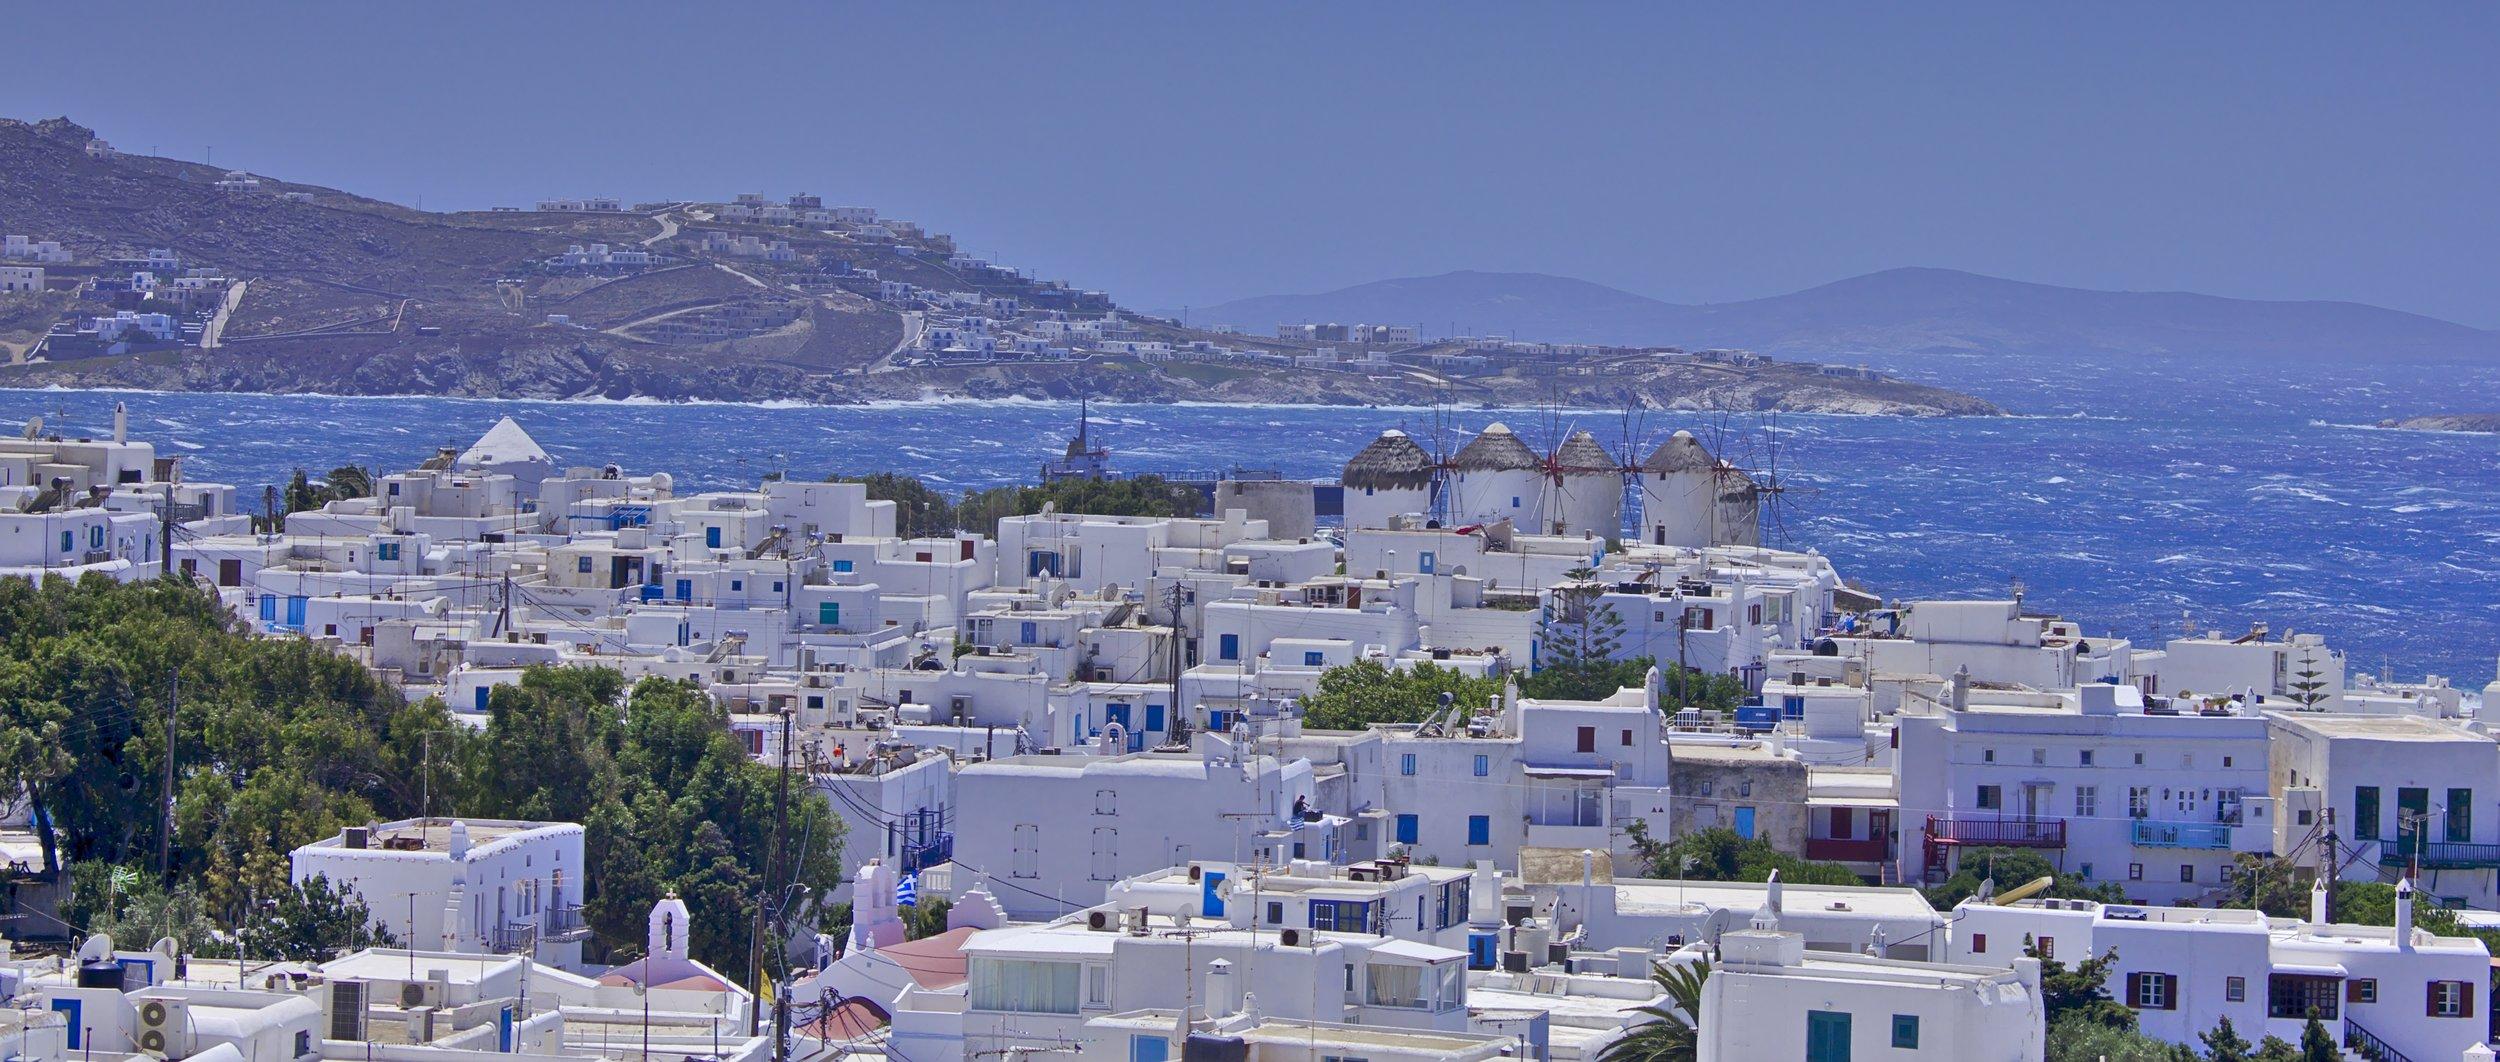 mykonos greece voyedge rx tour fitness travel